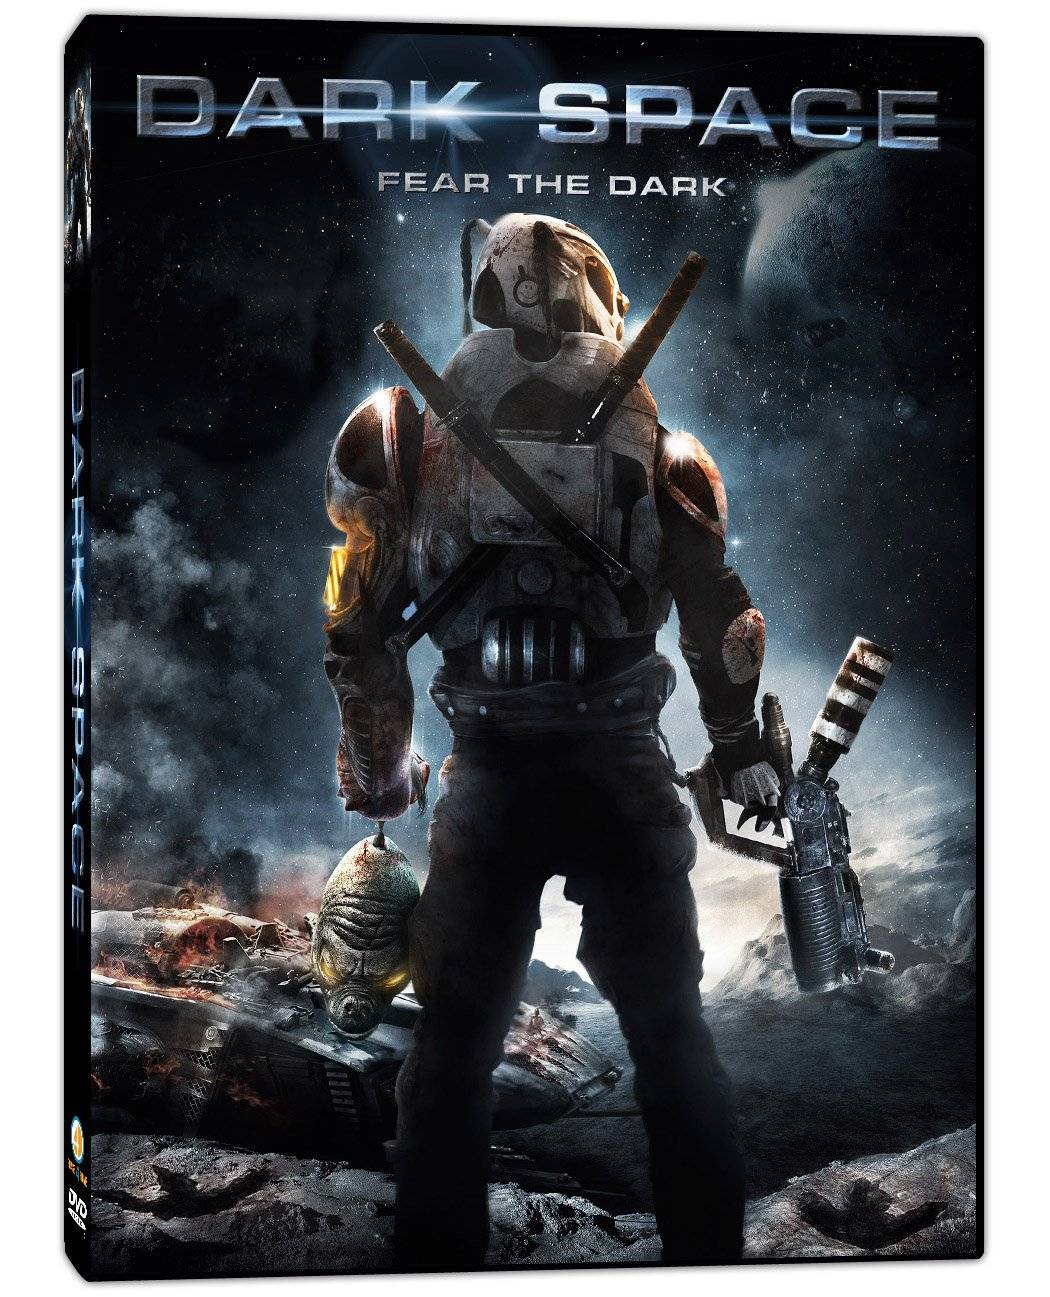 Justice League (2017) Dual Audio Full Movie Hindi English HDTS